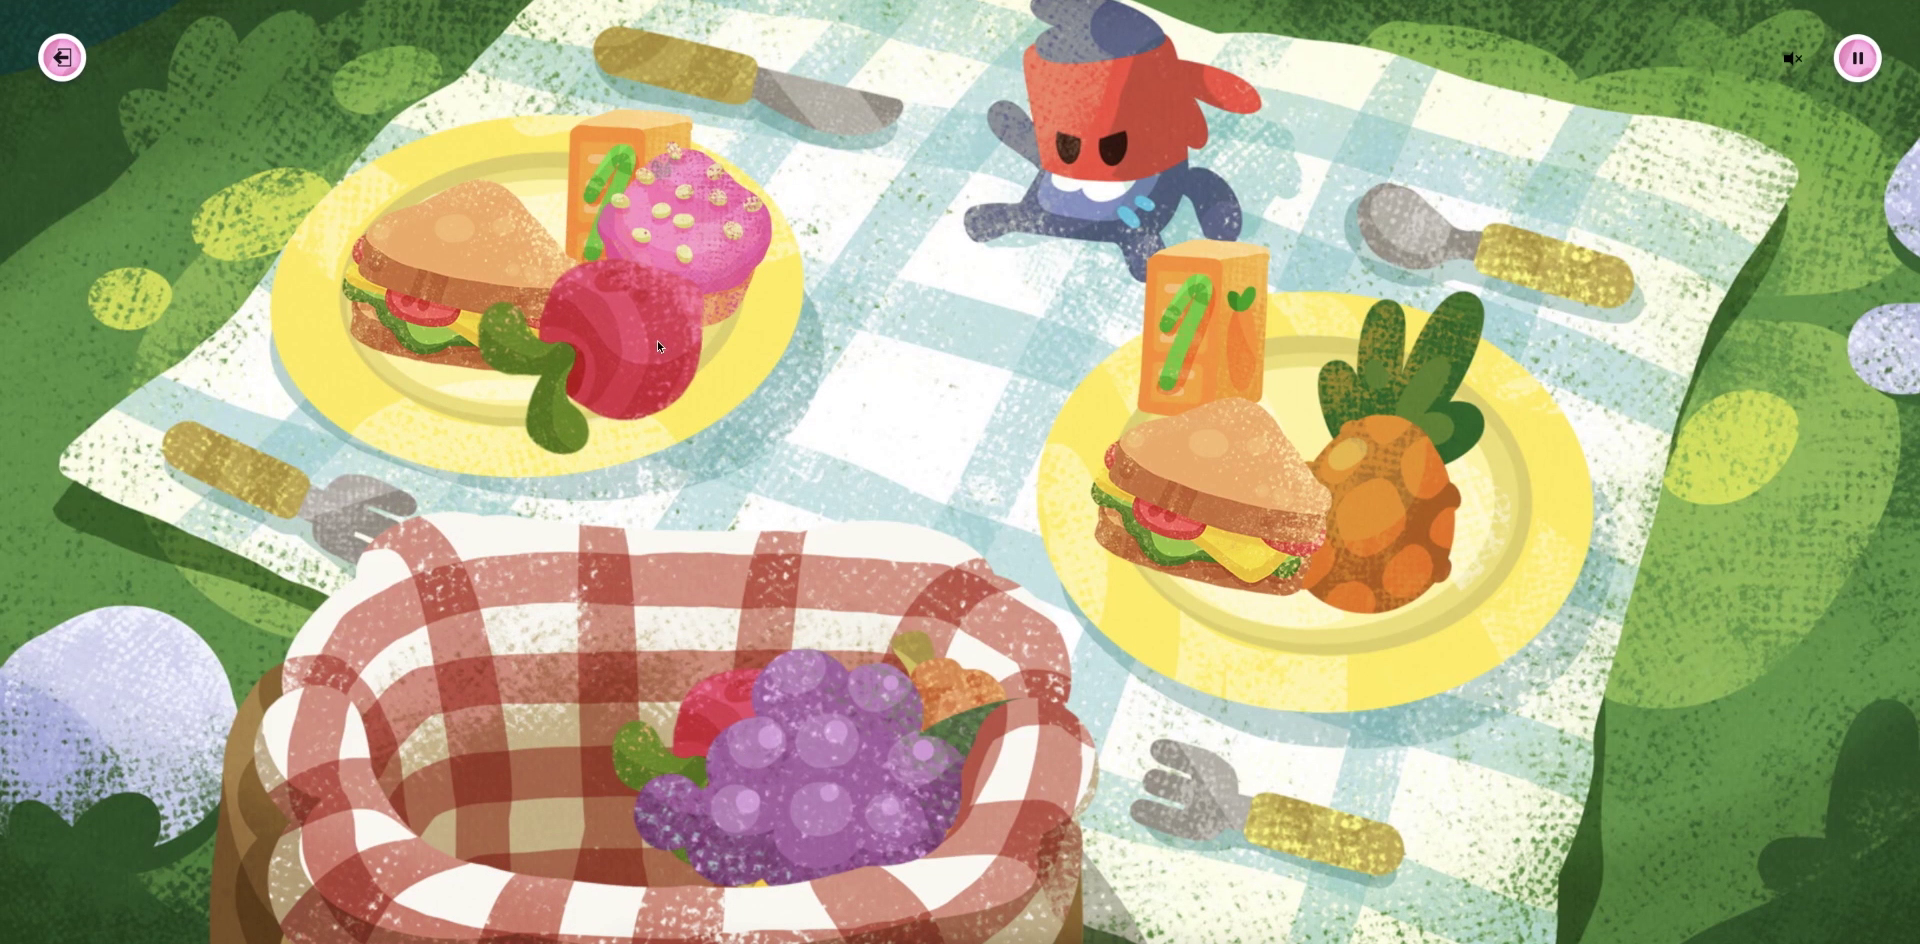 teemo_picnictime_e